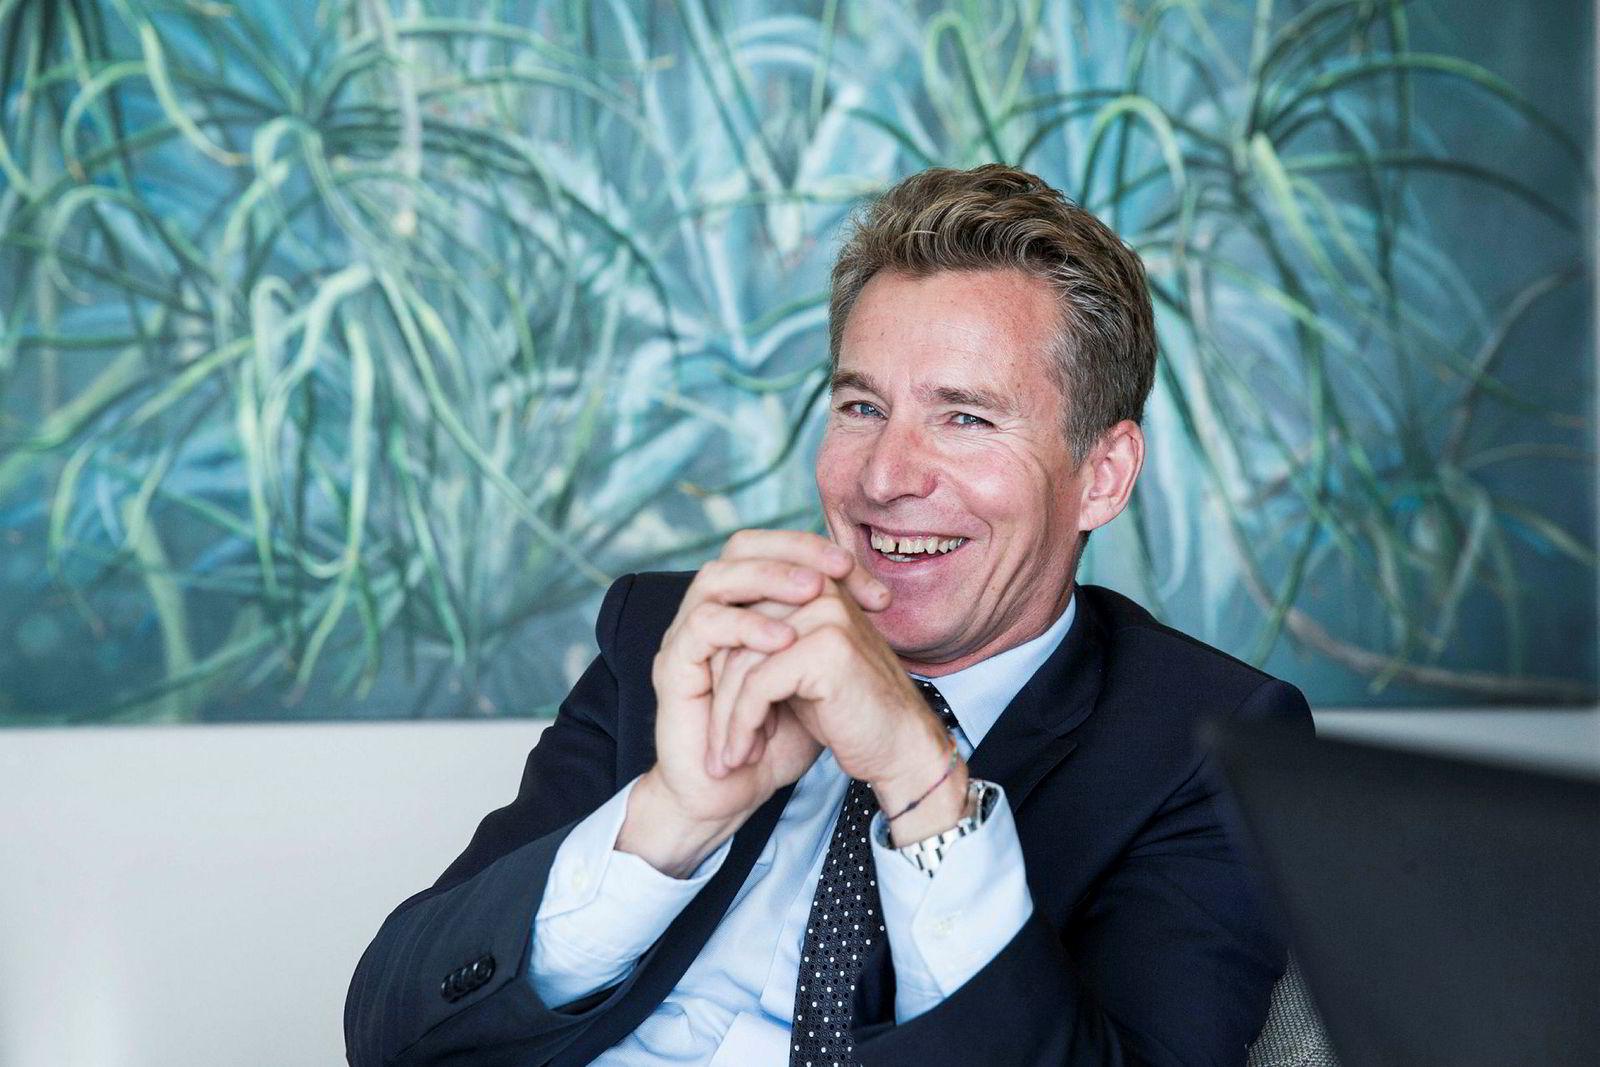 Hugo Maurstad i oppkjøpsfondet Altor ble valgt som styreleder i XXL på generalforsamlingen.